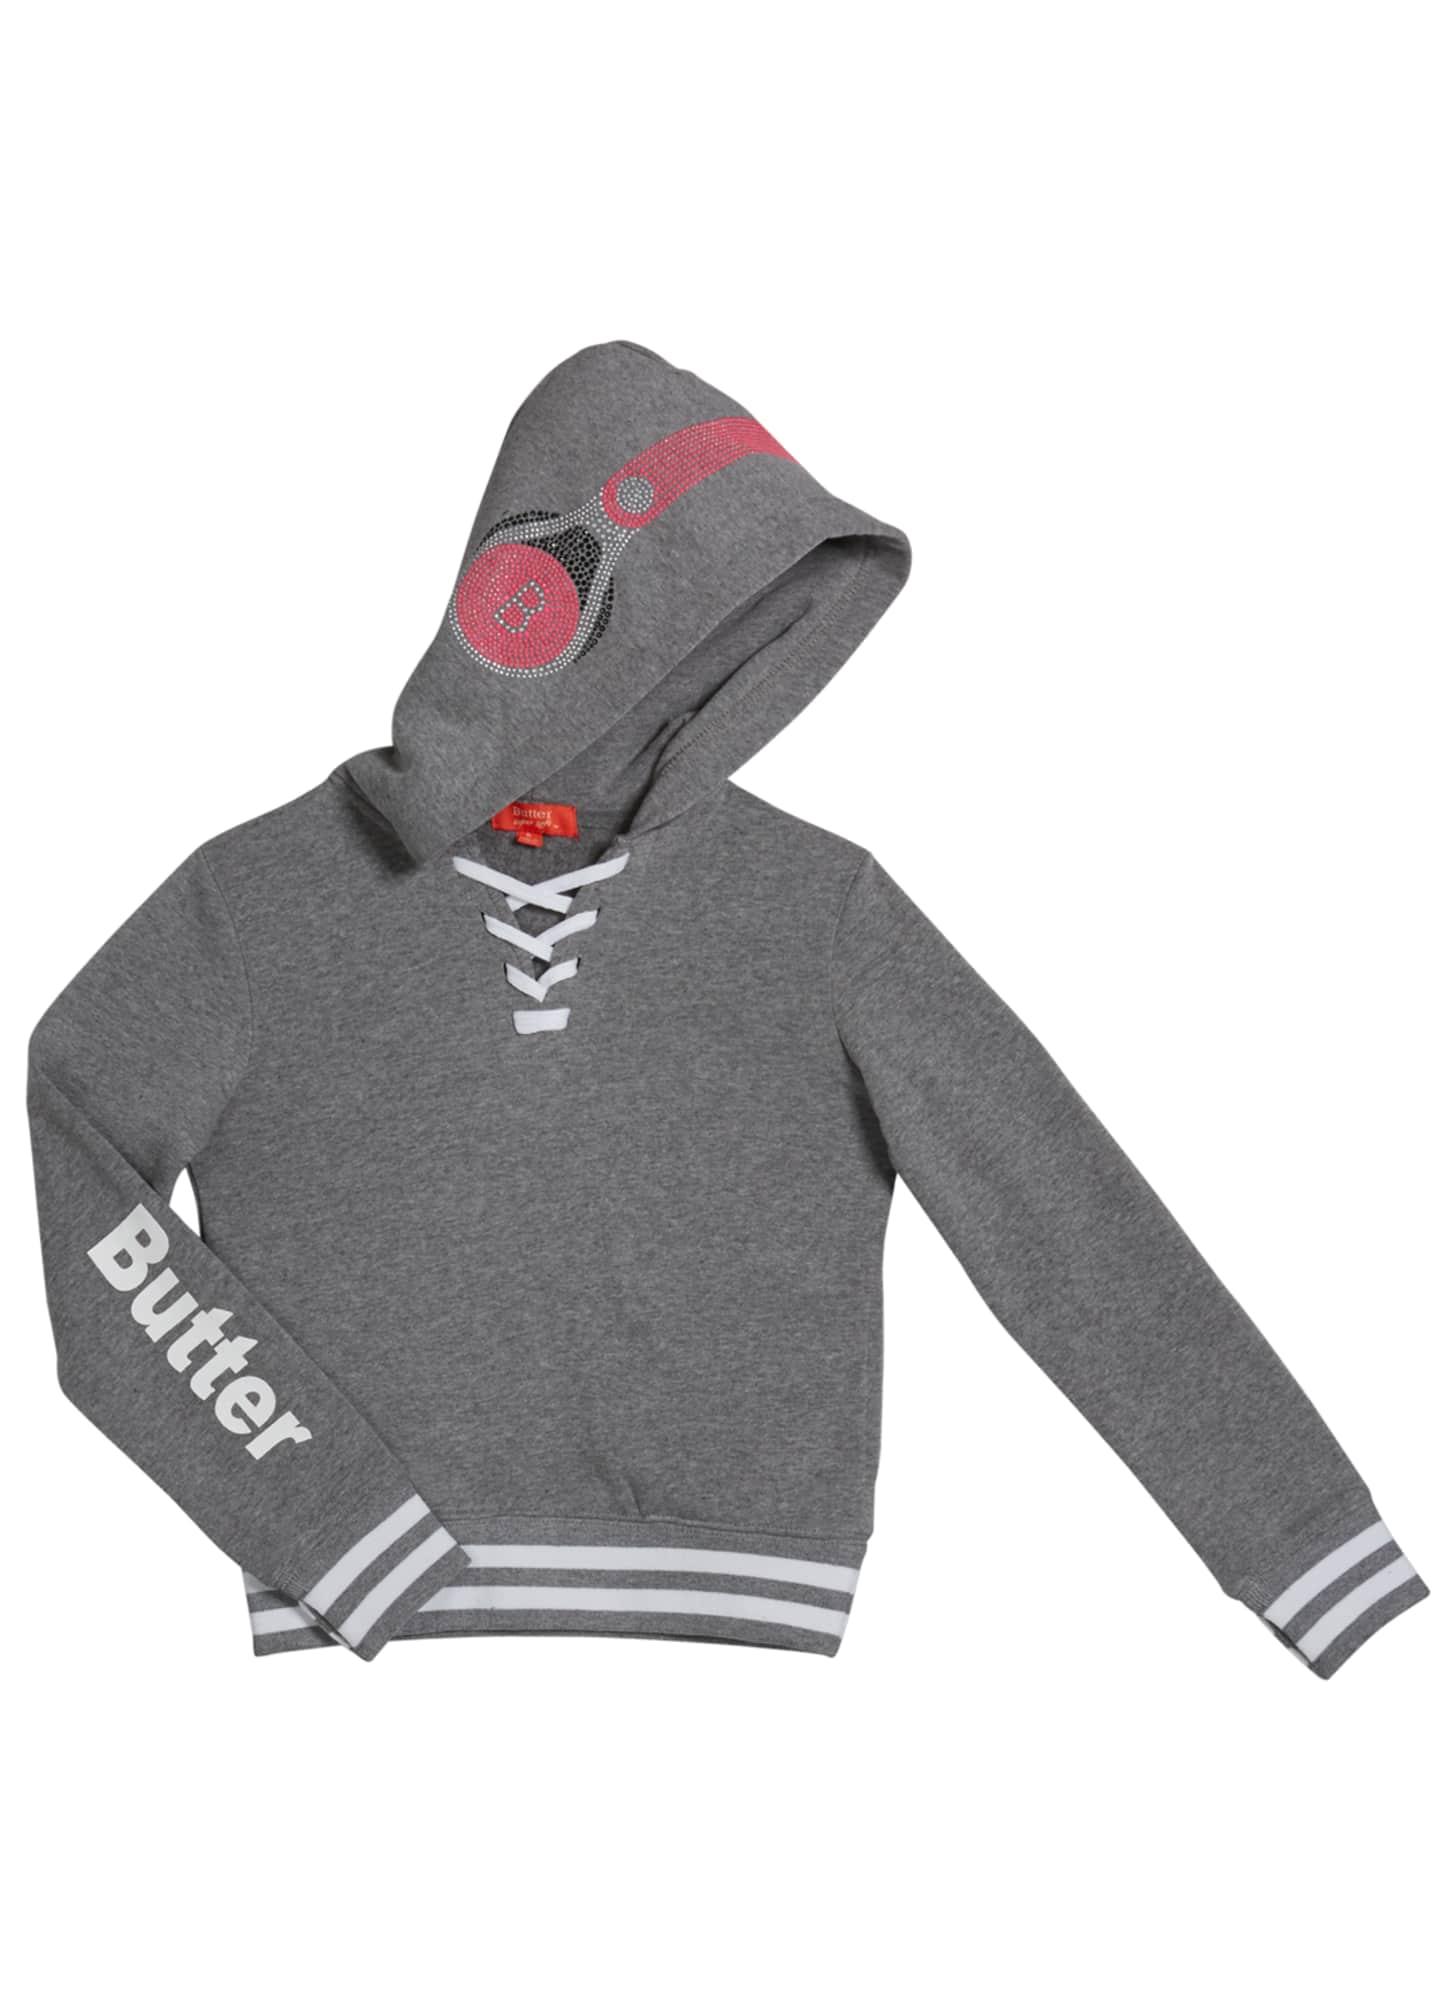 Butter Girl's Dance Mix Studded Hoodie Sweatshirt, Size